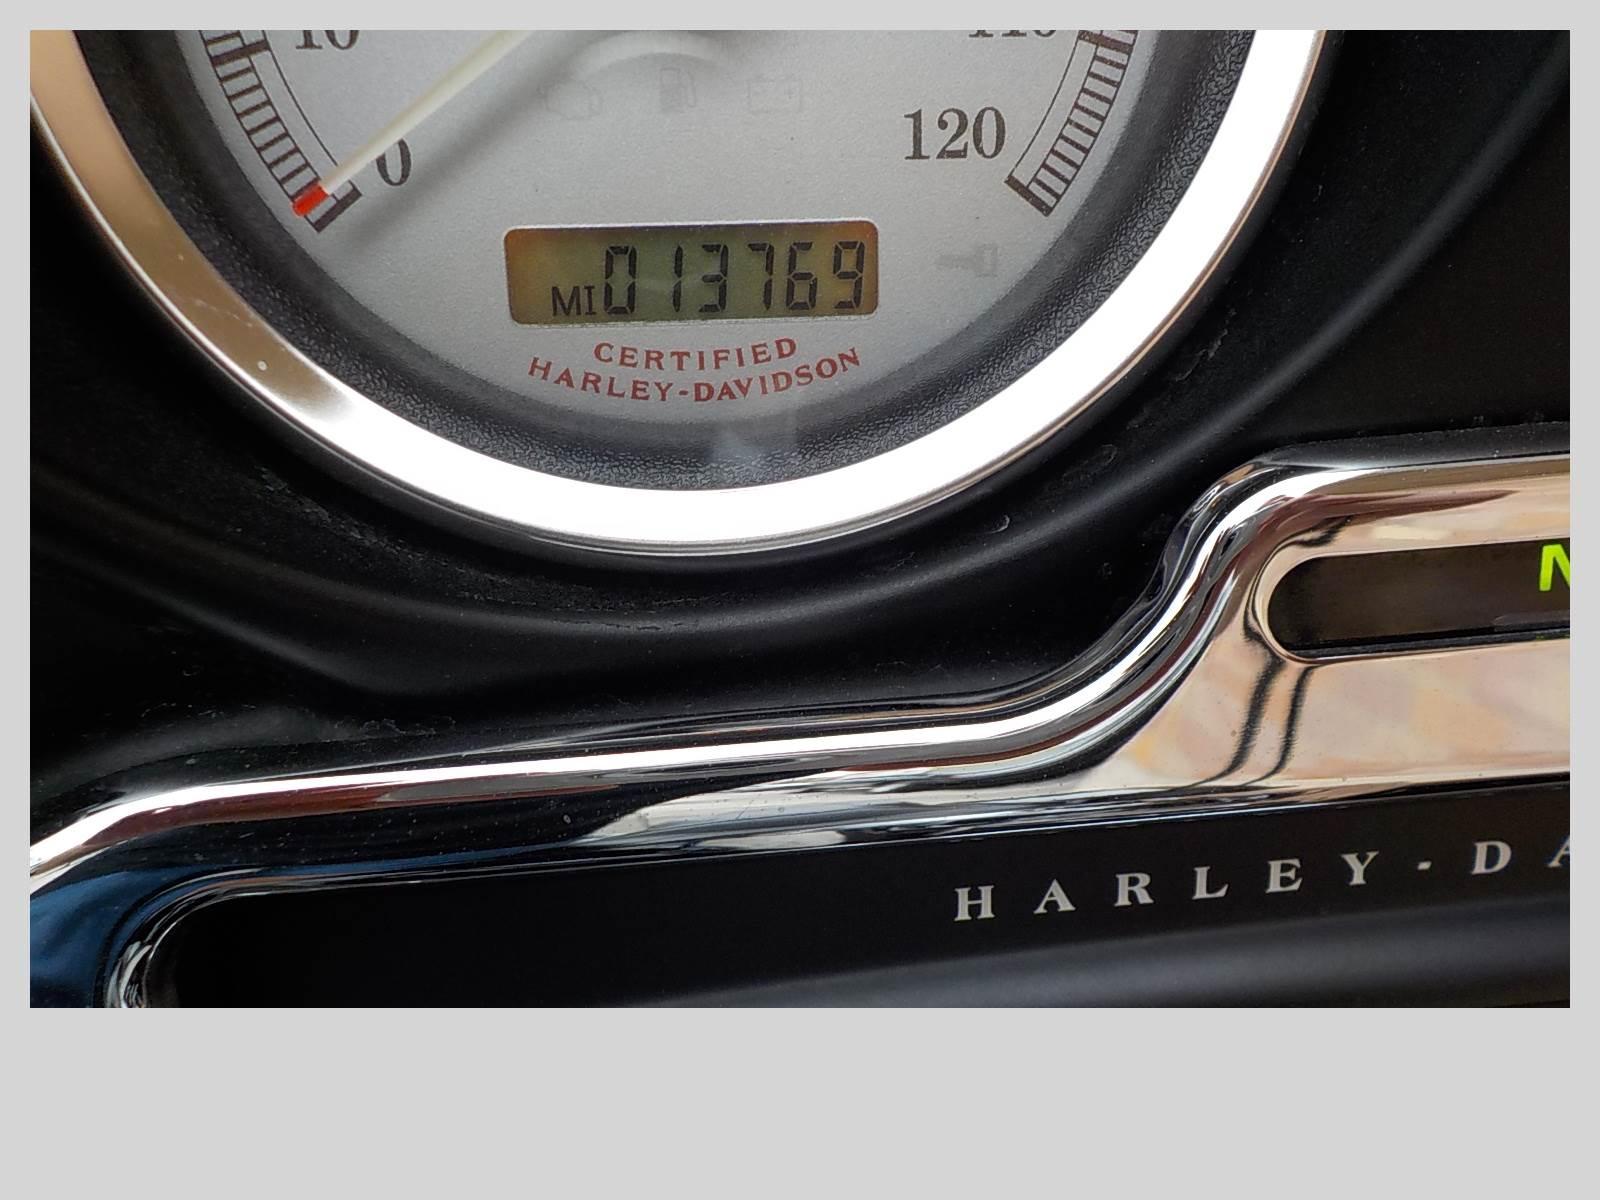 2006 Harley-Davidson Street Glide 7